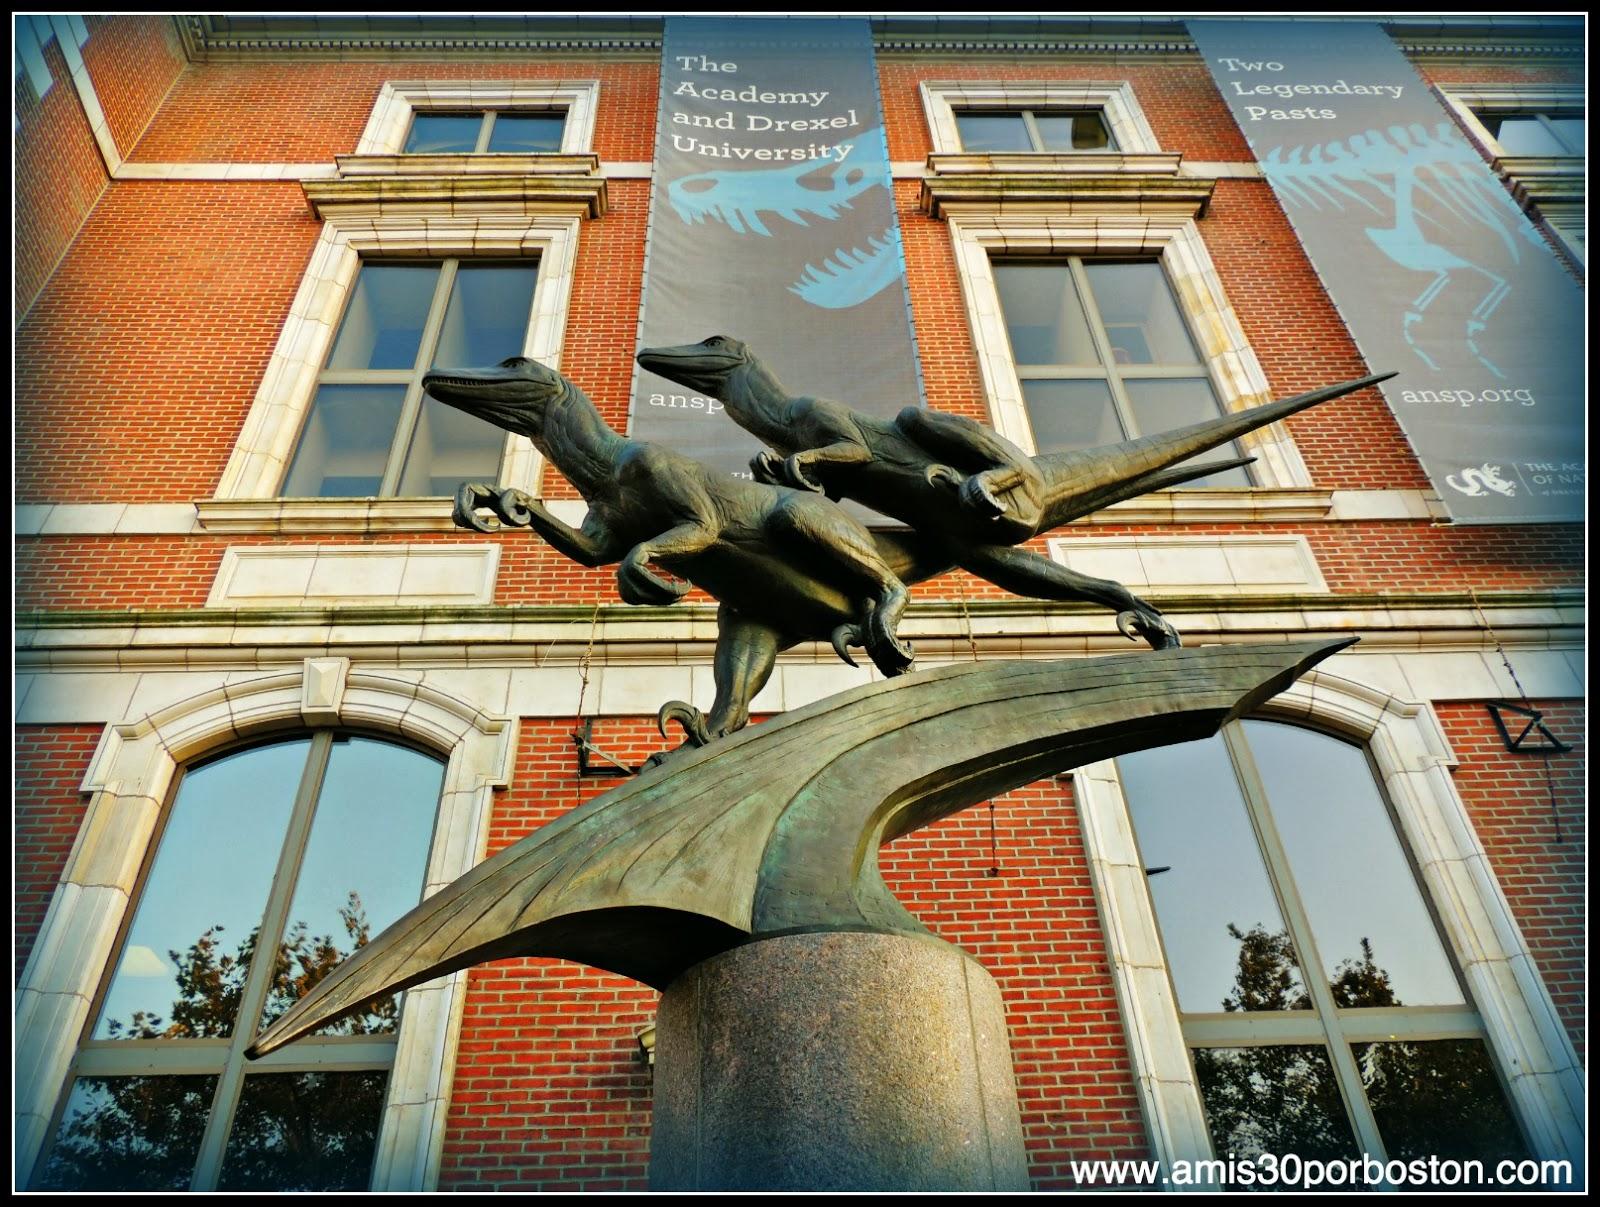 Filadelfia: Academy of Natural Sciences of Drexel University